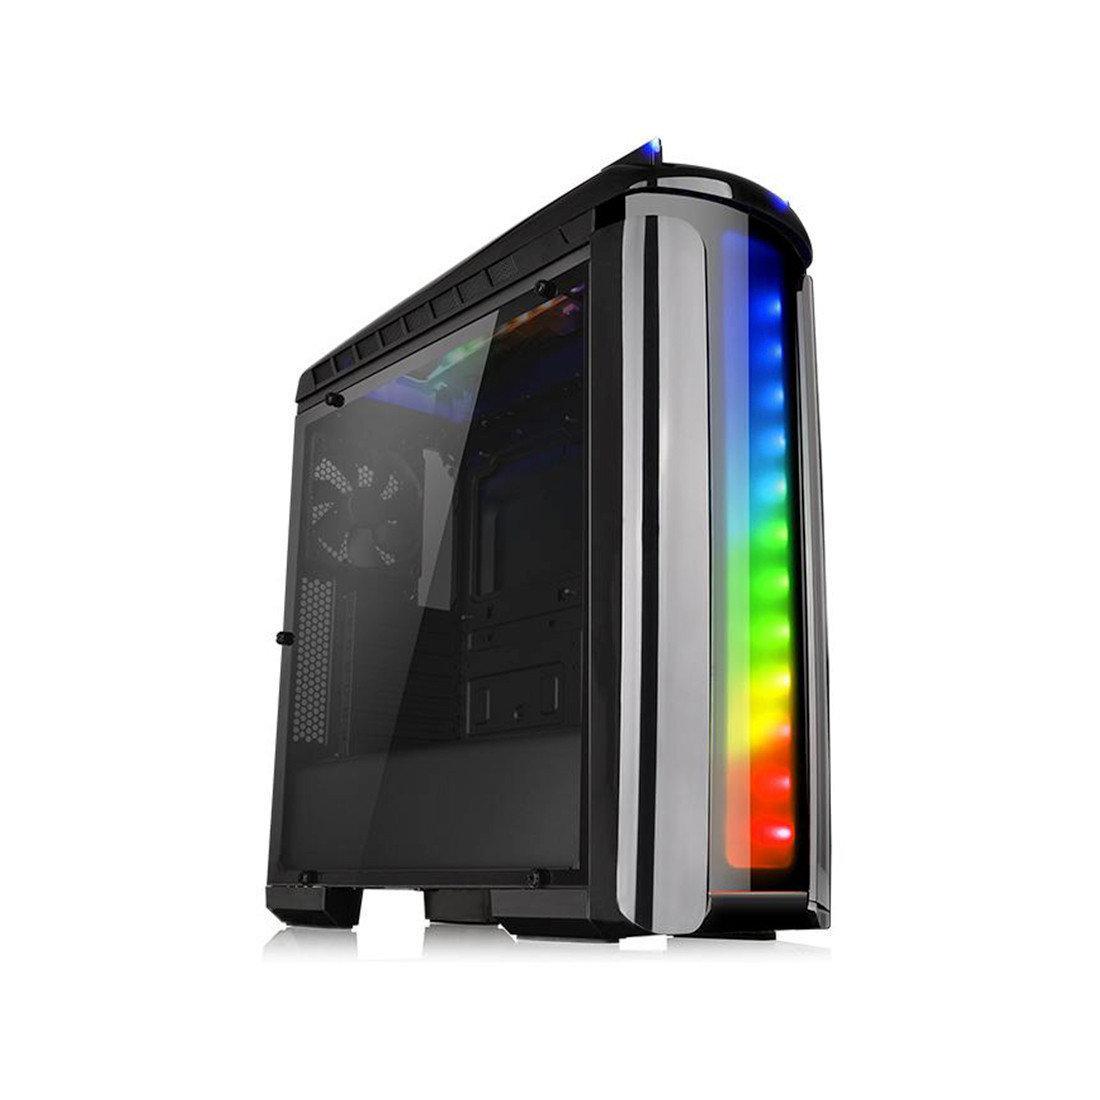 Системный блок Intel Core i3-7100 3.9GHZ/H110/DDR4 4GB/HDD 1TB/450W